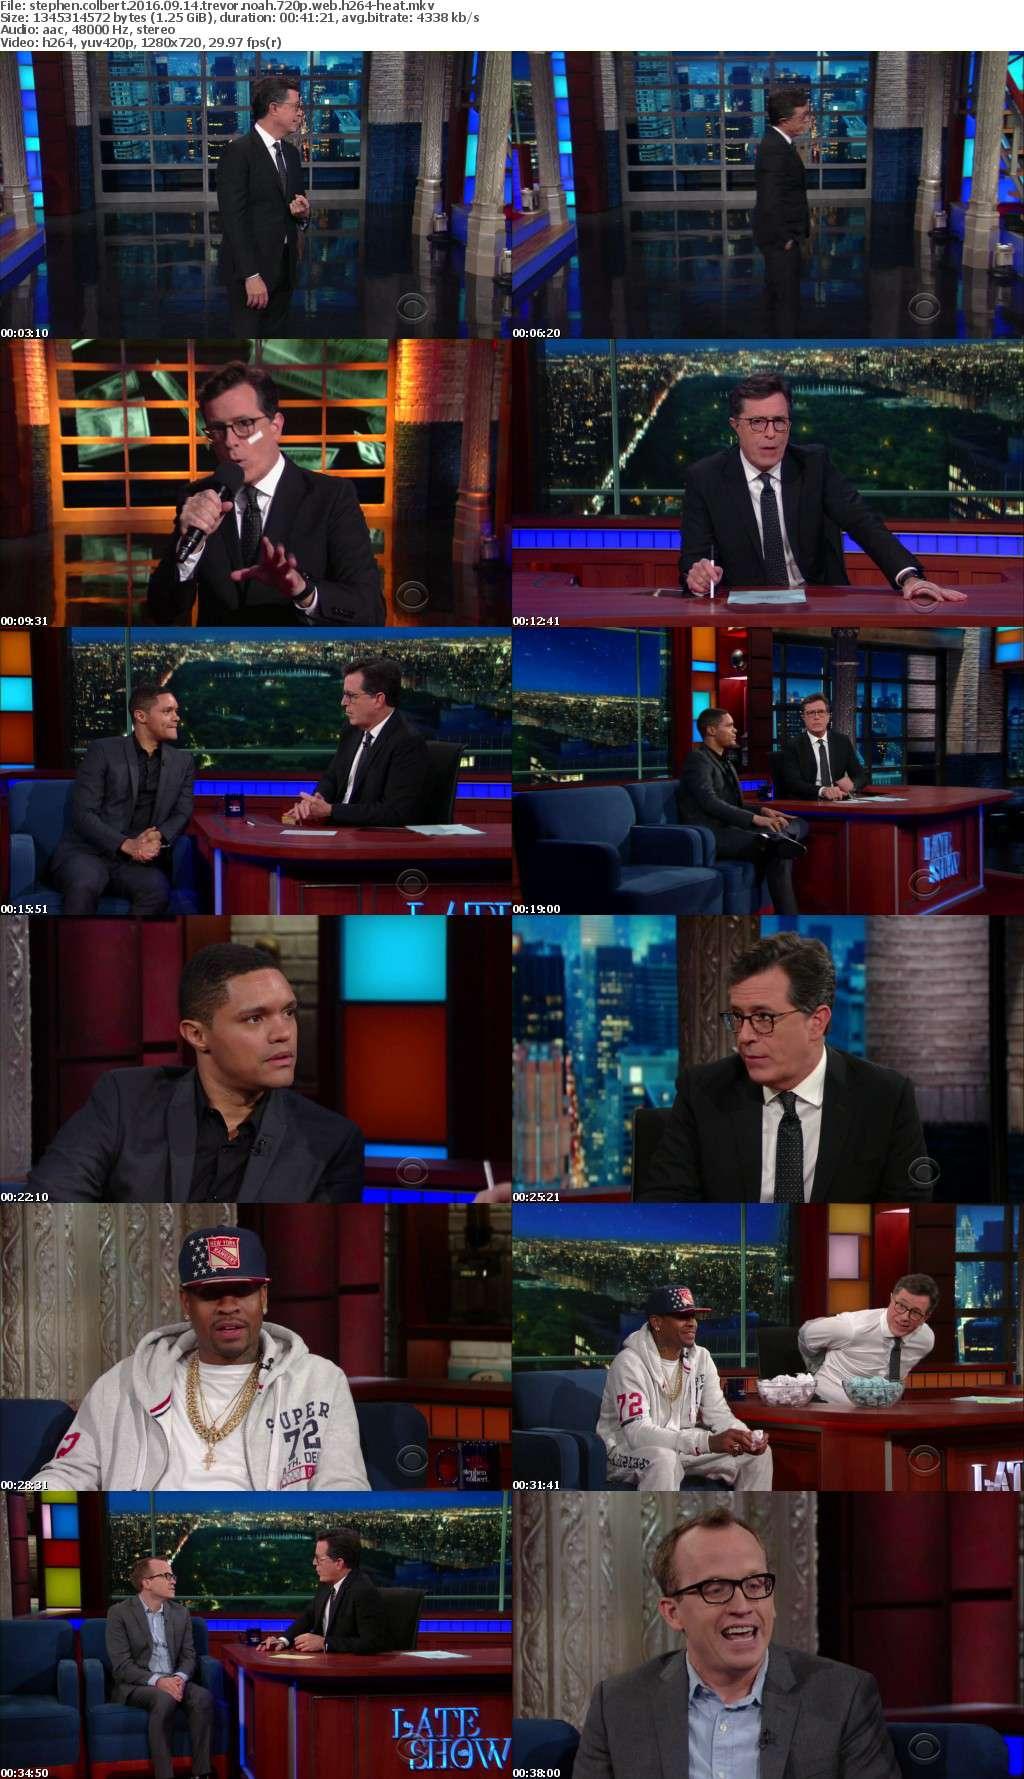 Stephen Colbert 2016 09 14 Trevor Noah 720p WEB h264-HEAT